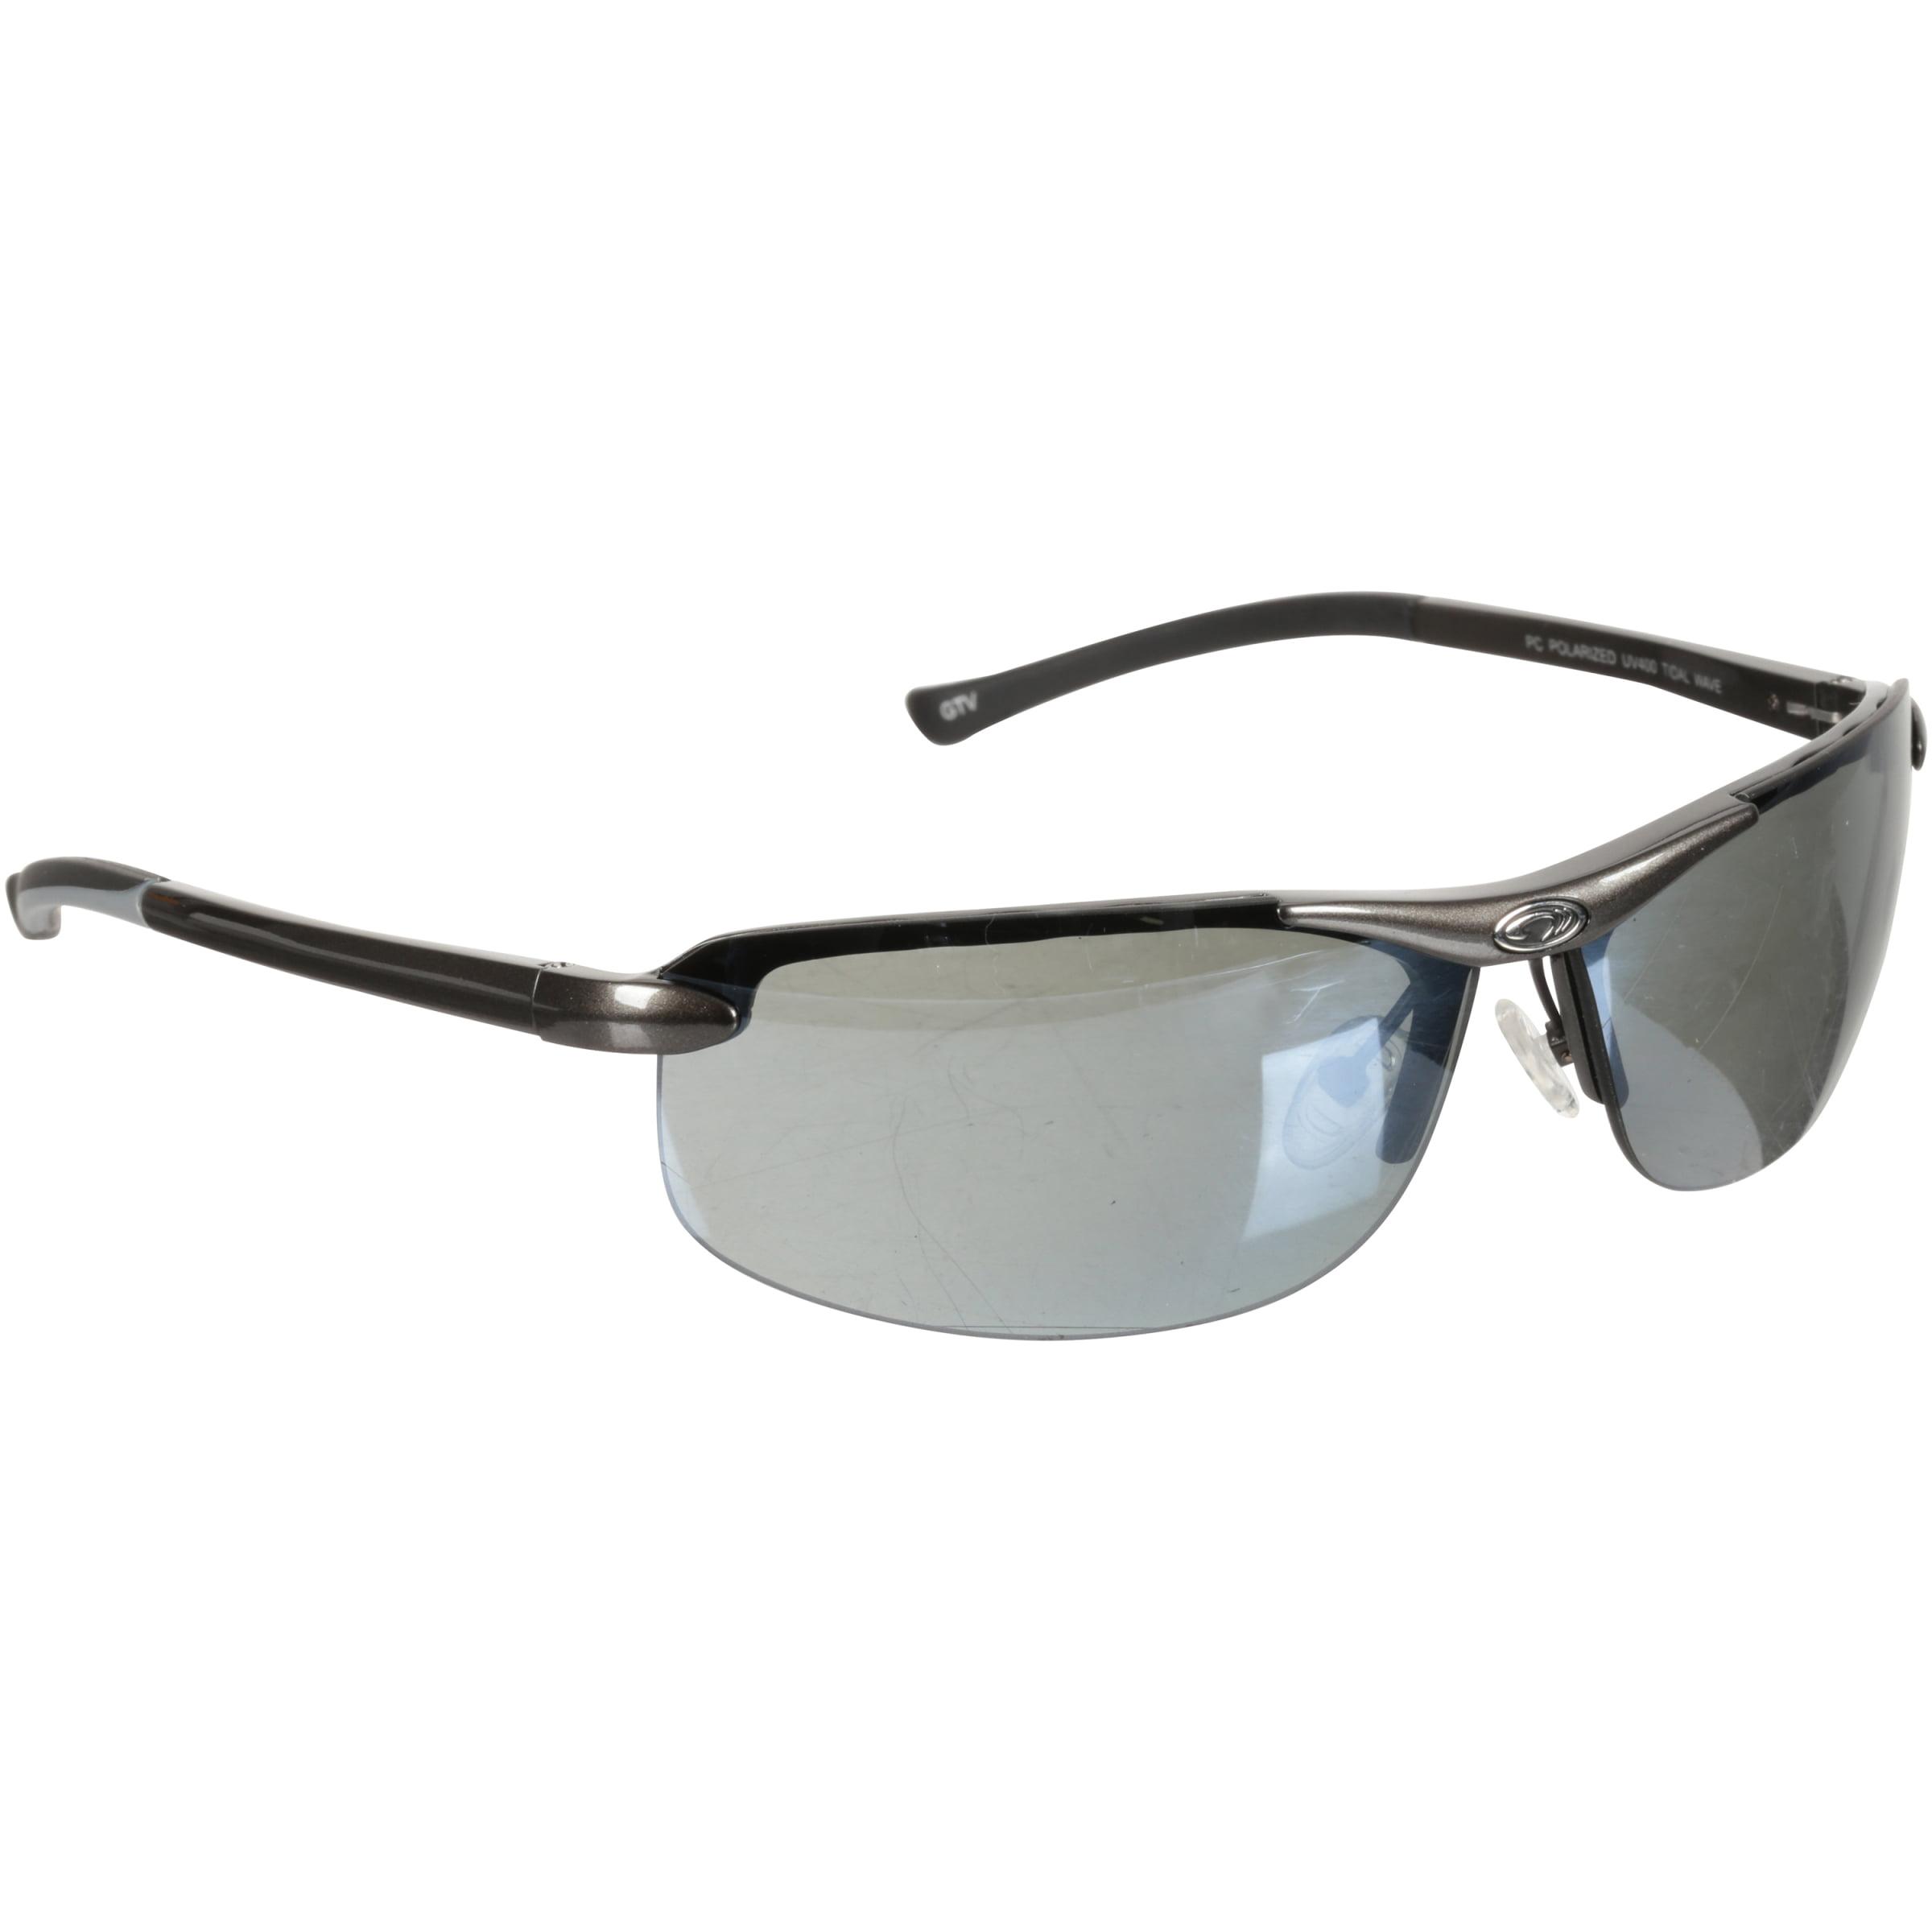 5181c81f17f Octo tidal wave aluminum alloy frame polarized optics sunglasses jpeg  450x450 Polarized optics